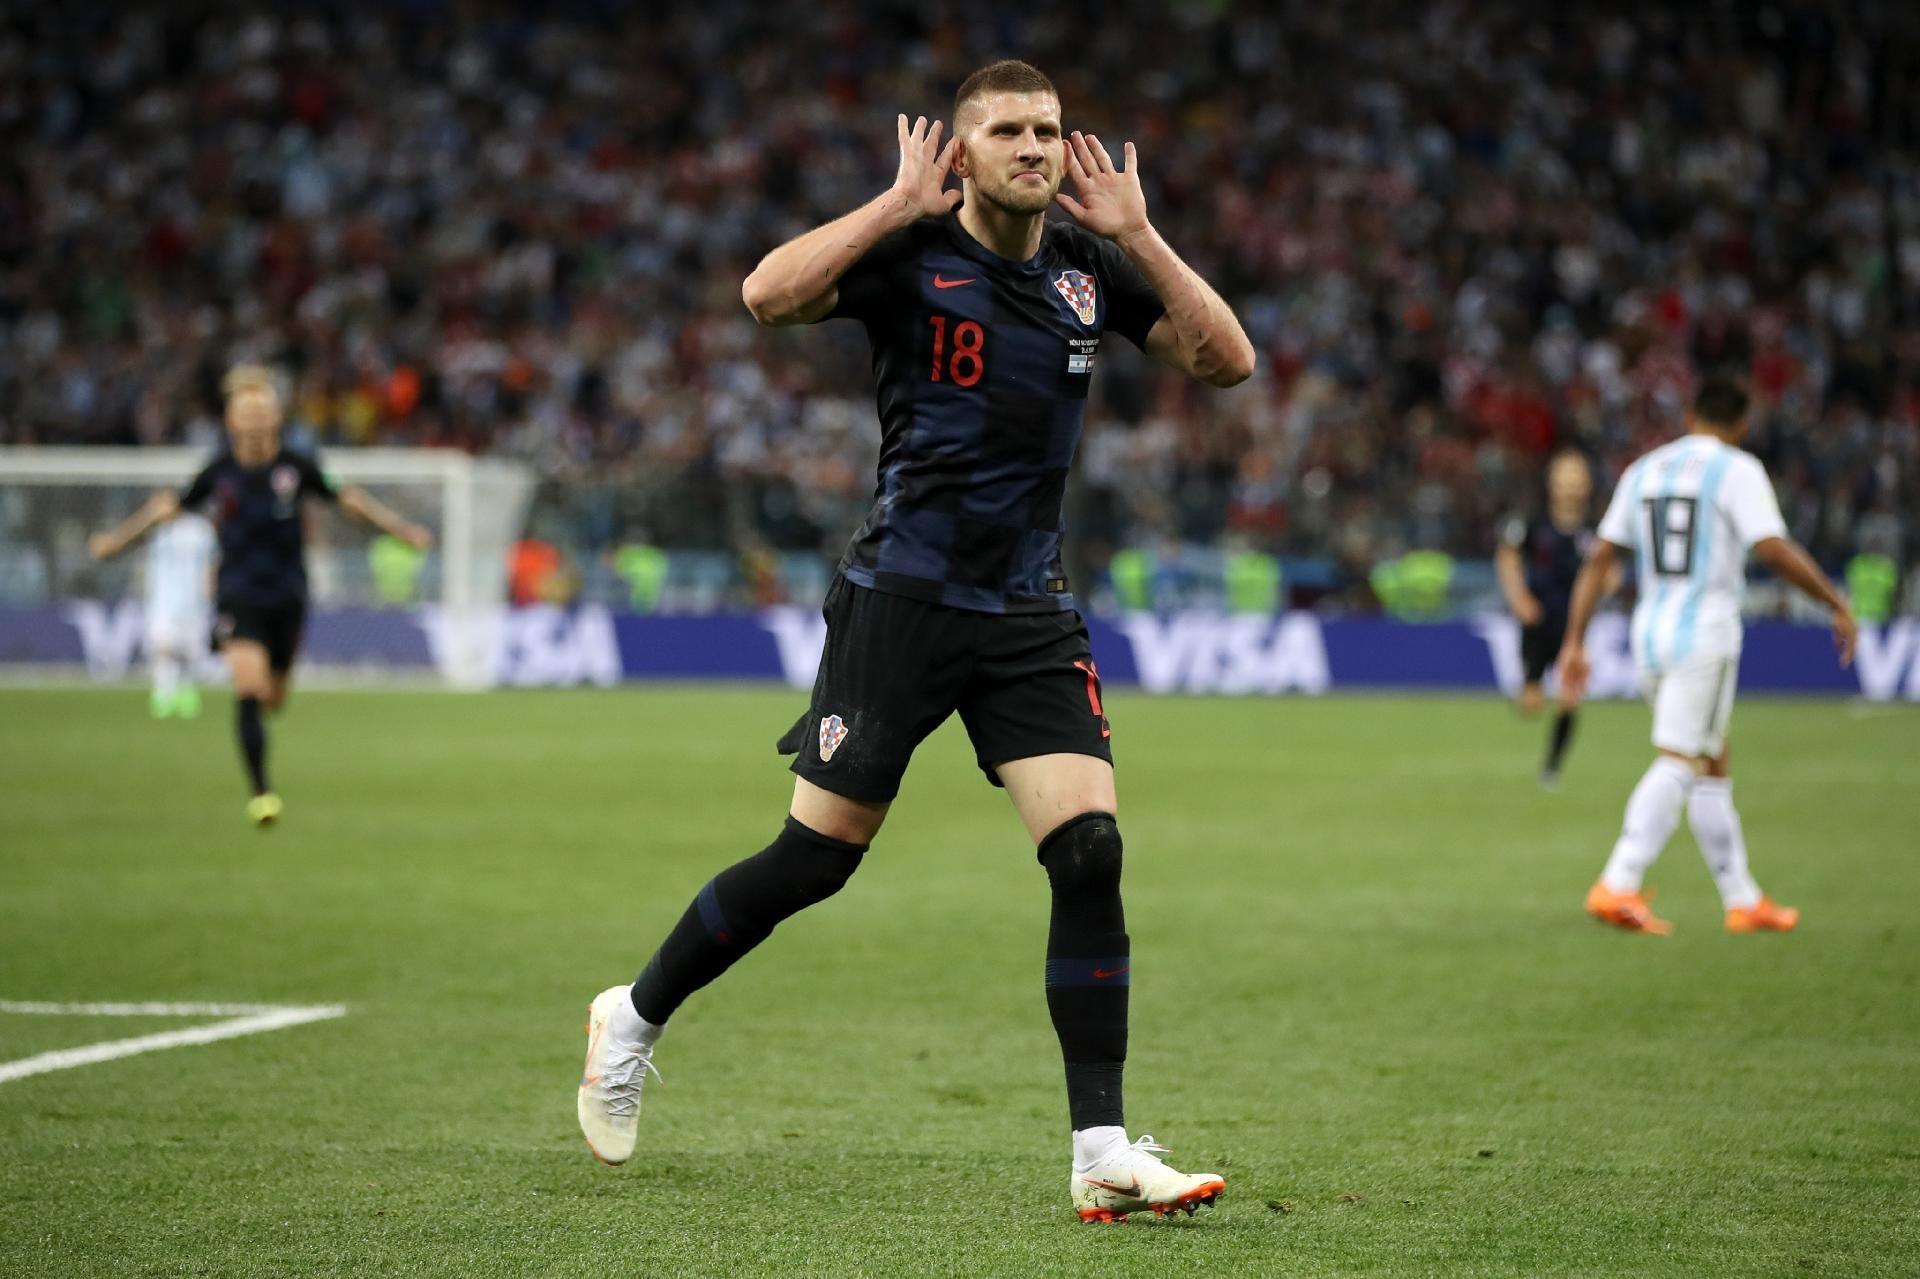 Croácia na Copa 2018 Na bronca argentinos croata desiste de pedir camisa de Messi UOL Copa do Mundo 2018